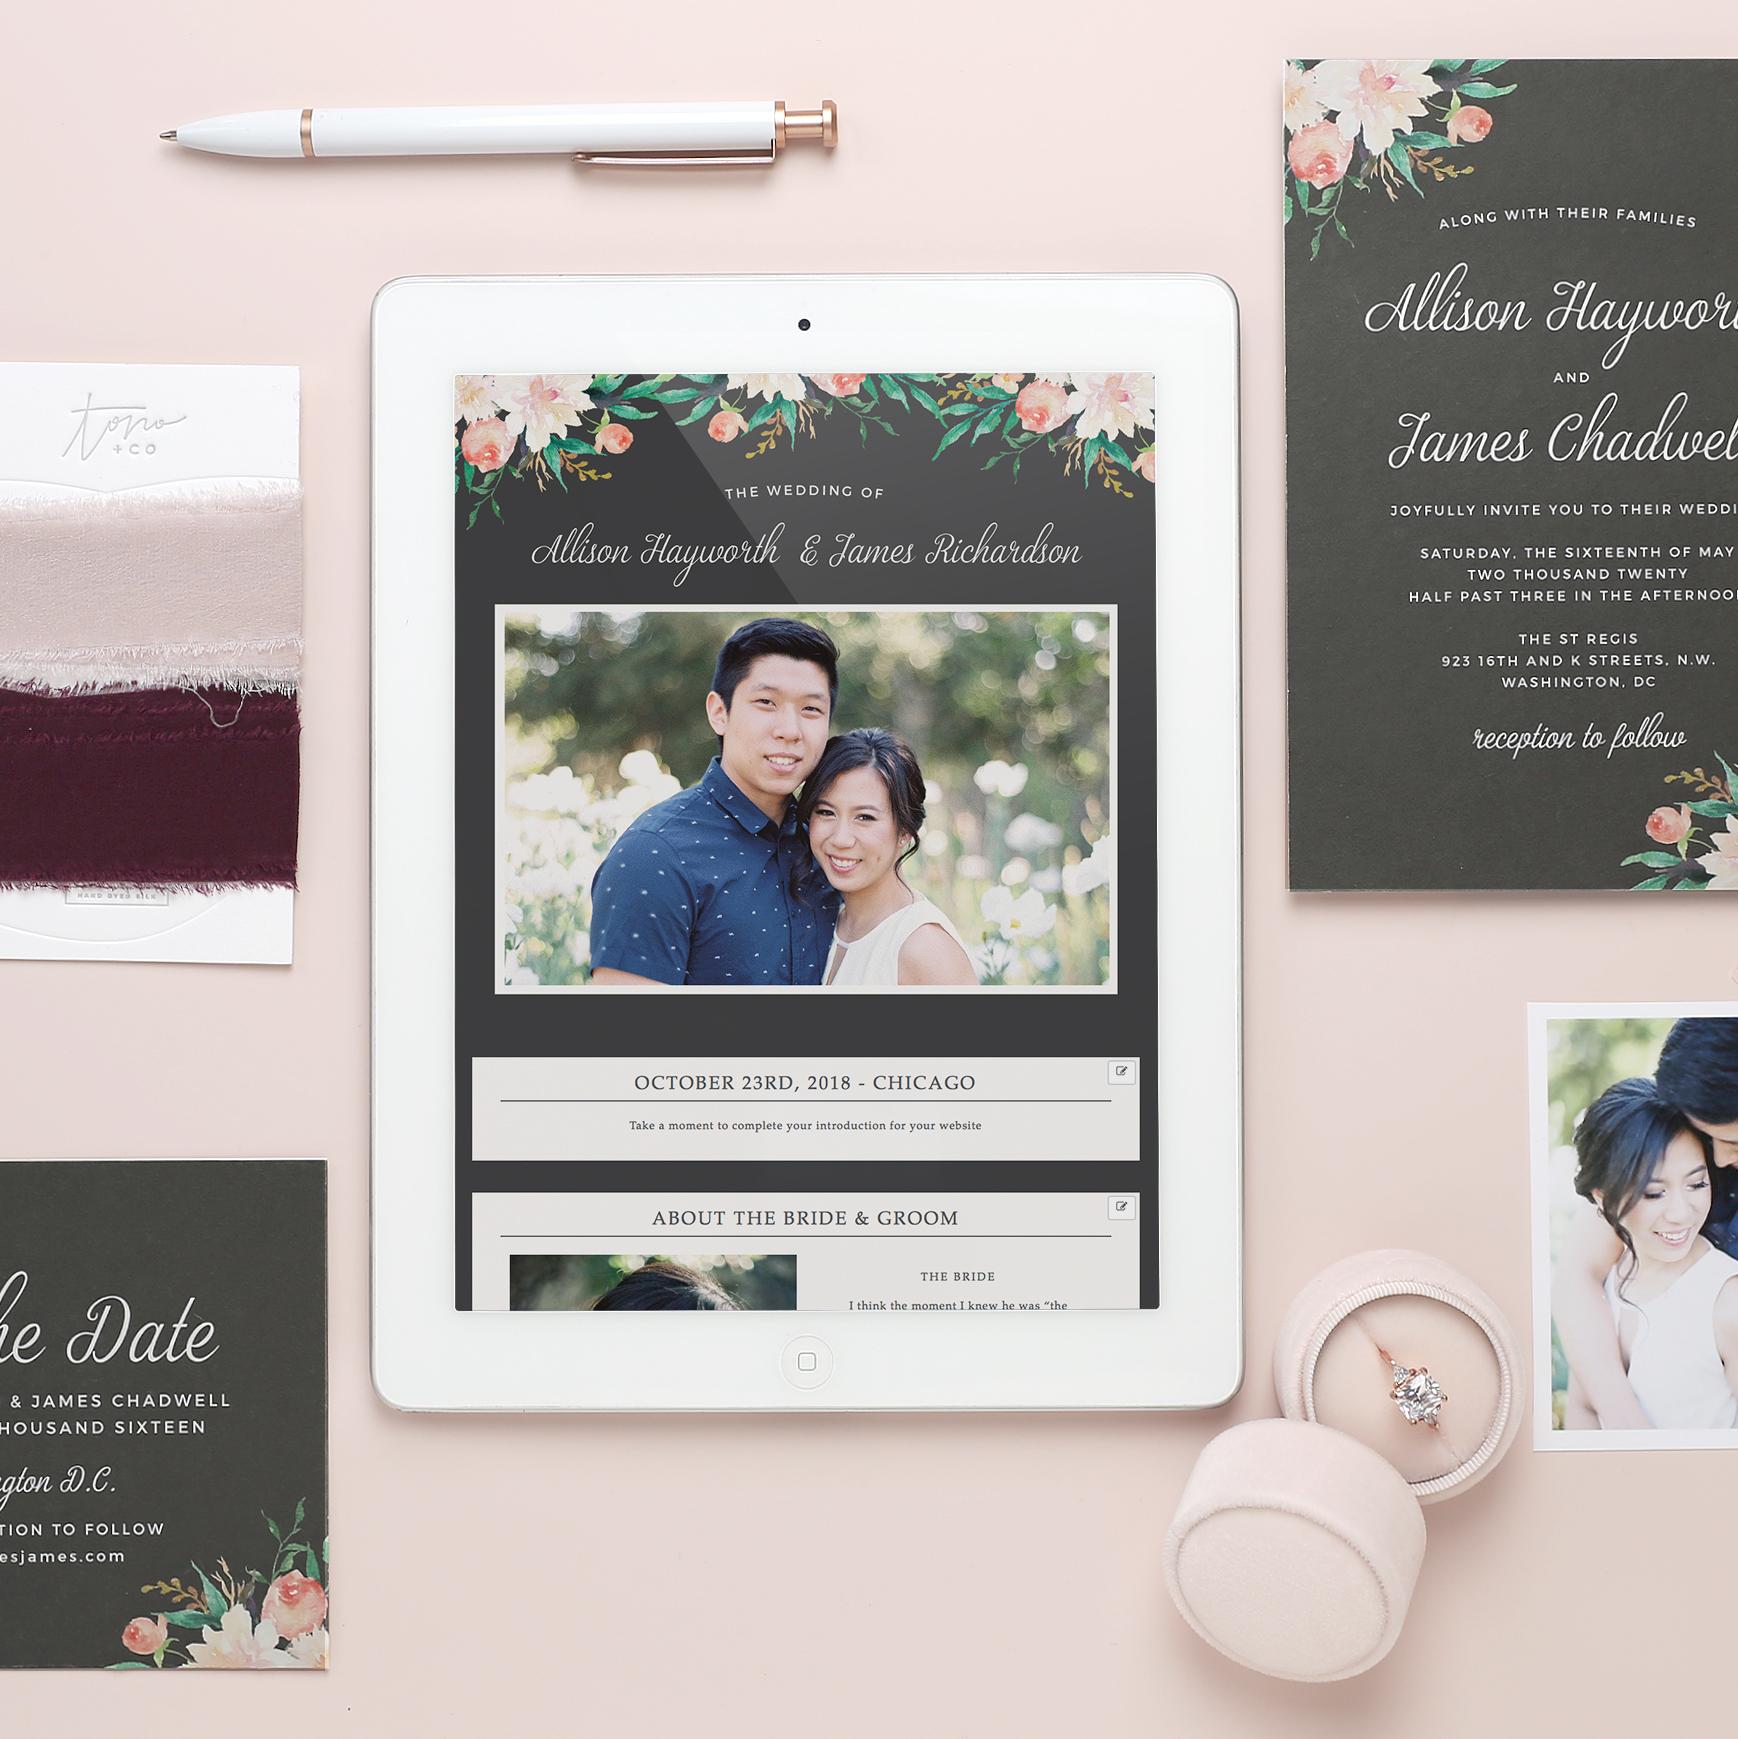 Basic_Invite_Wedding_Suites_24.jpg